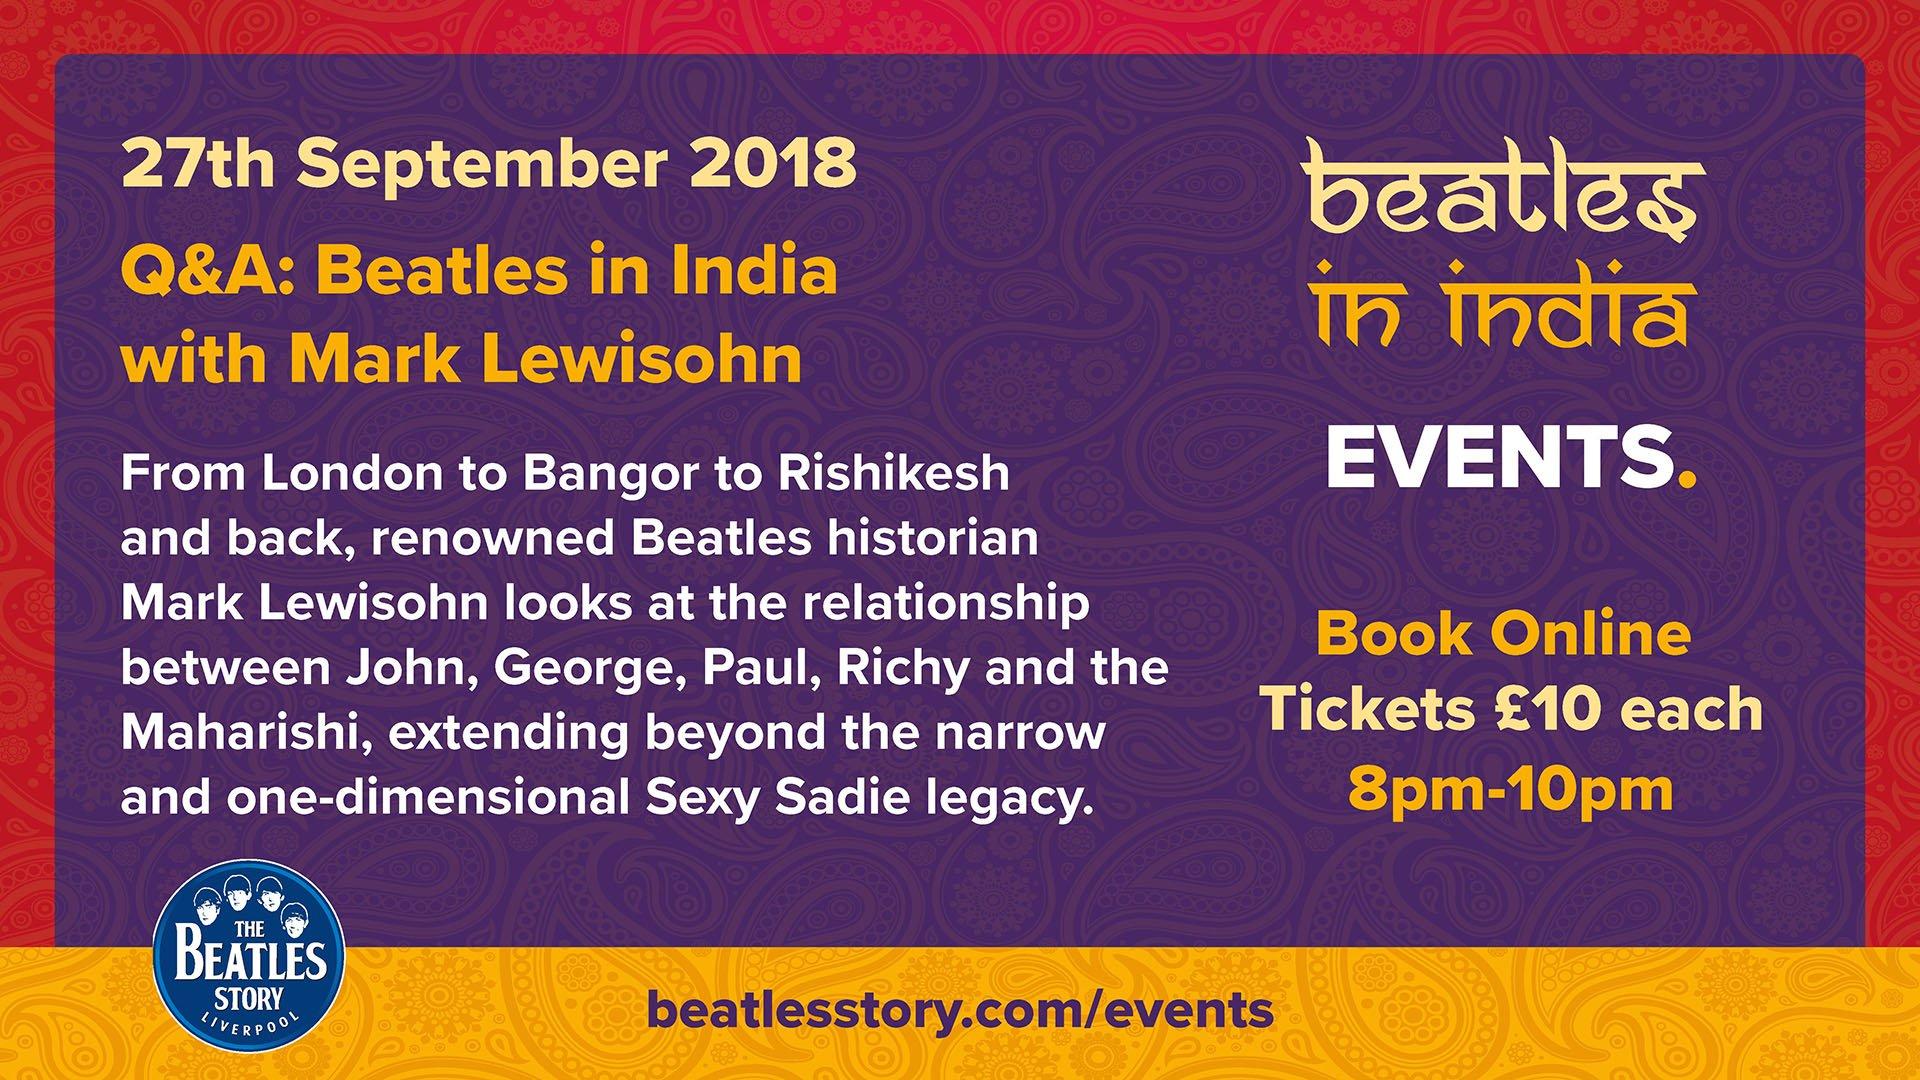 The Beatles Story On Twitter Beatles Historian